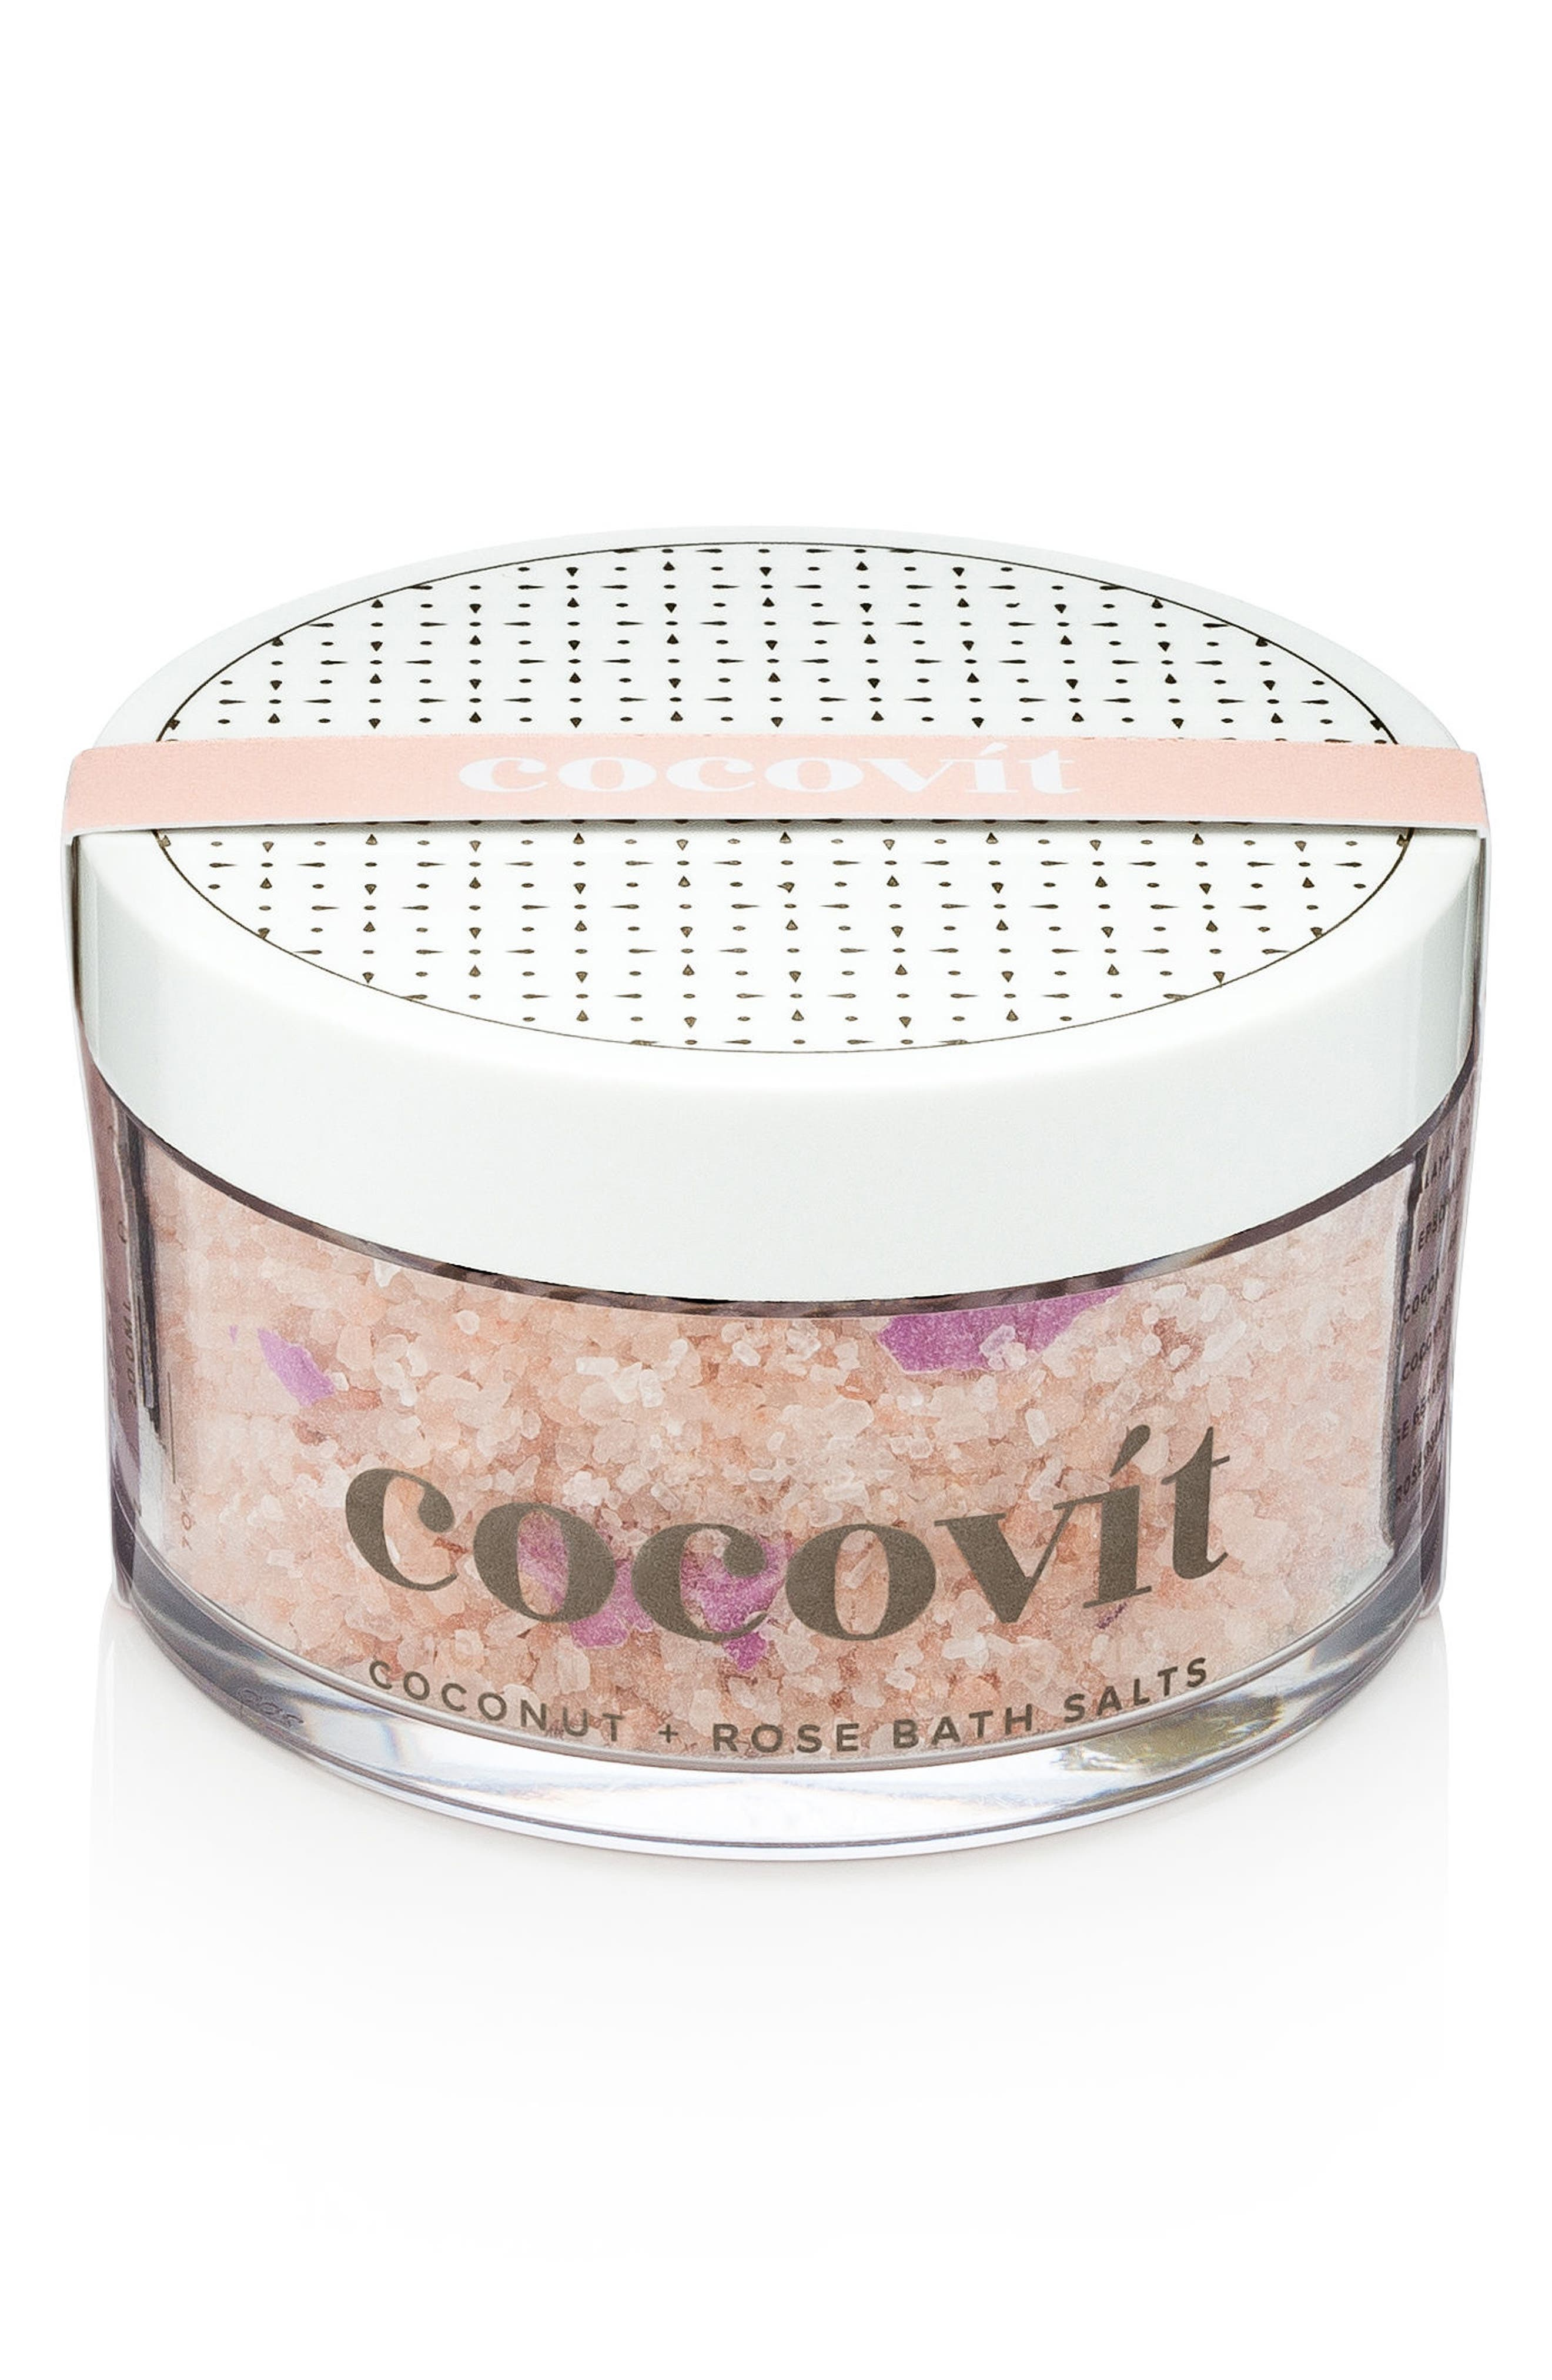 Coconut + Rose Bath Salts,                         Main,                         color, 000